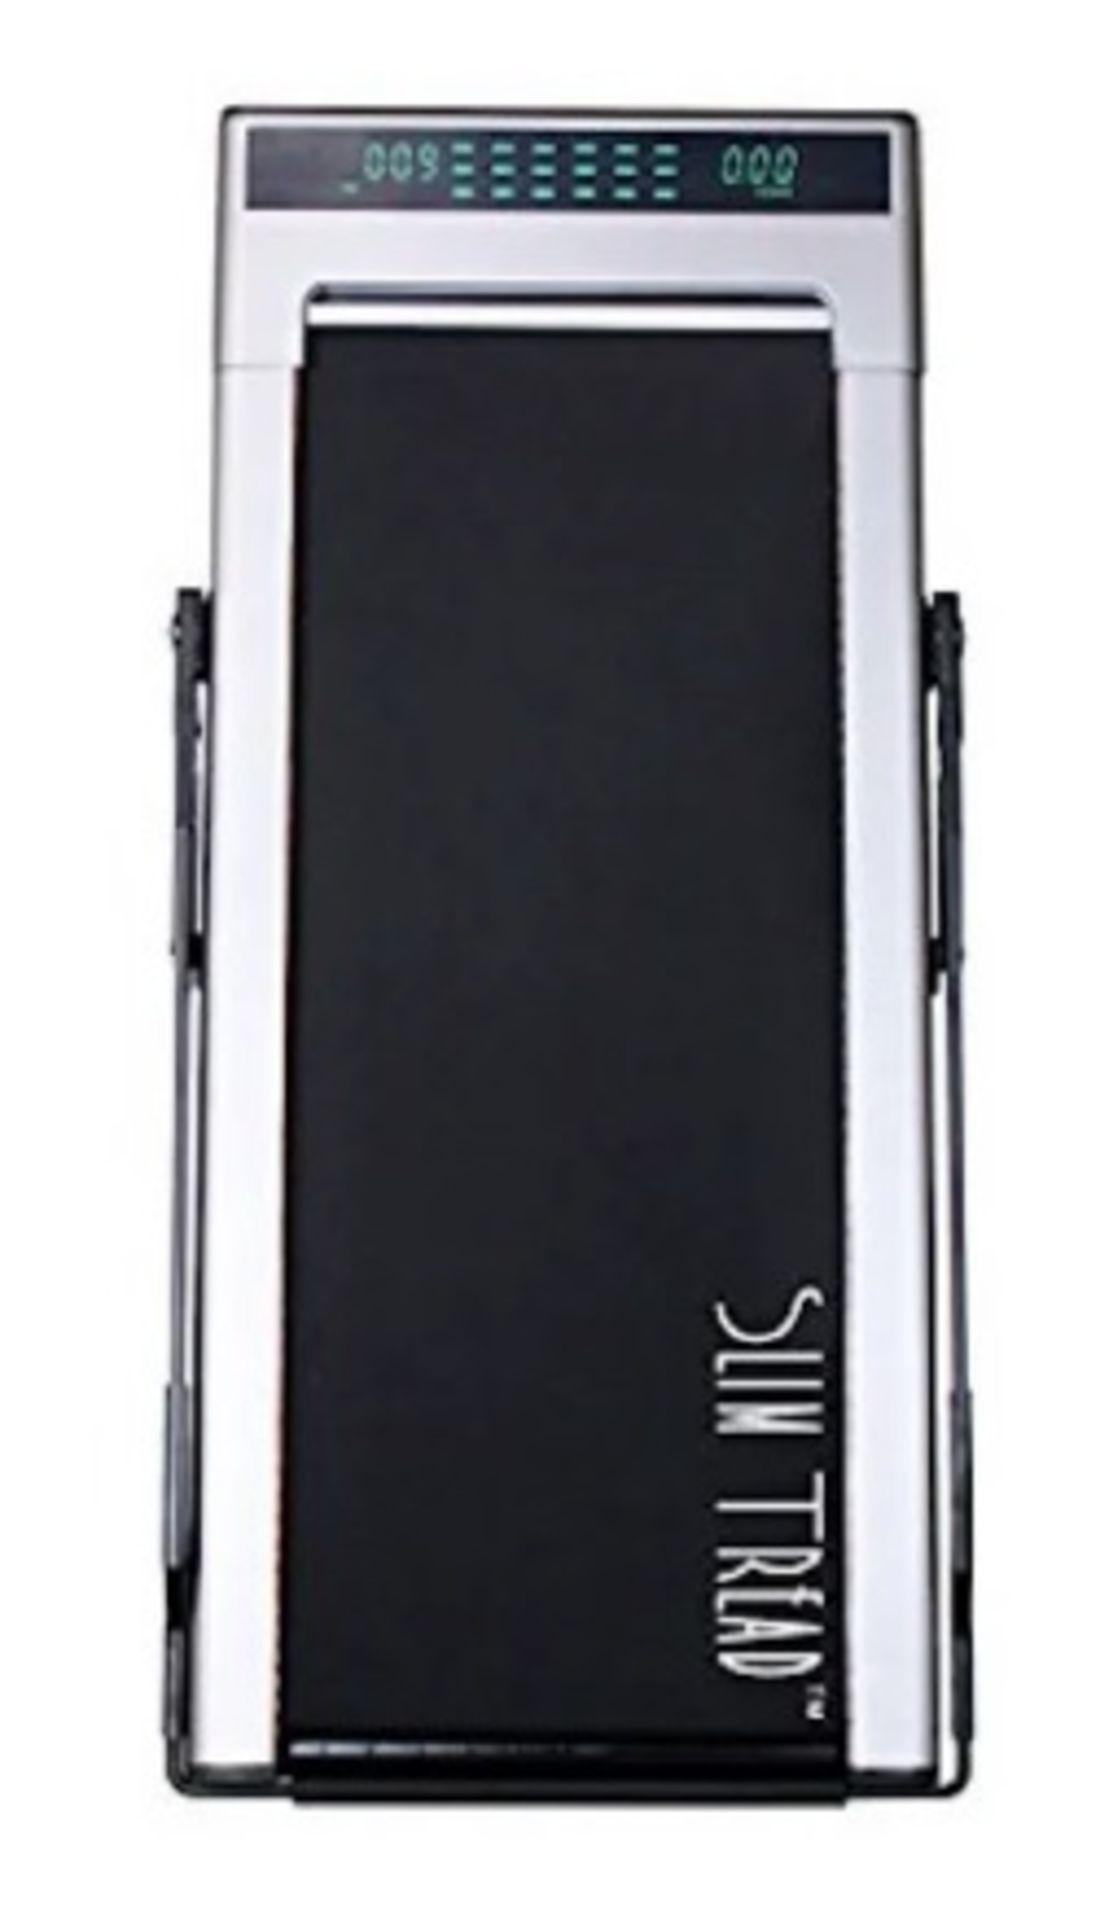 1 x Slim Tread Ultra Thin Smart Treadmill Running / Walking Machine - Lightweight With Folding - Image 2 of 19